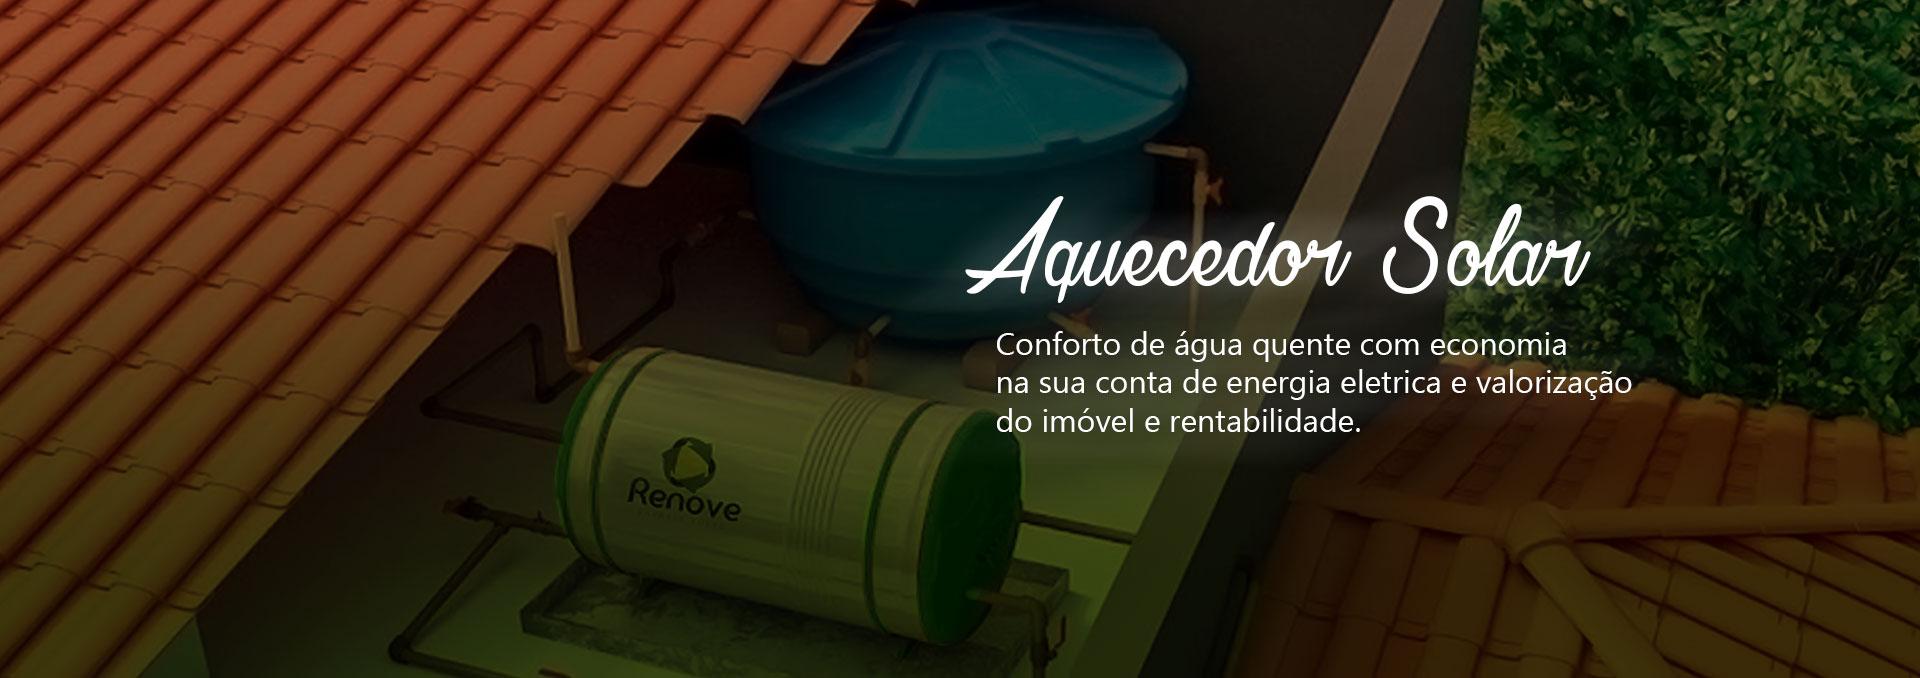 Aquecedor de água solar que produz energia limpa e barata